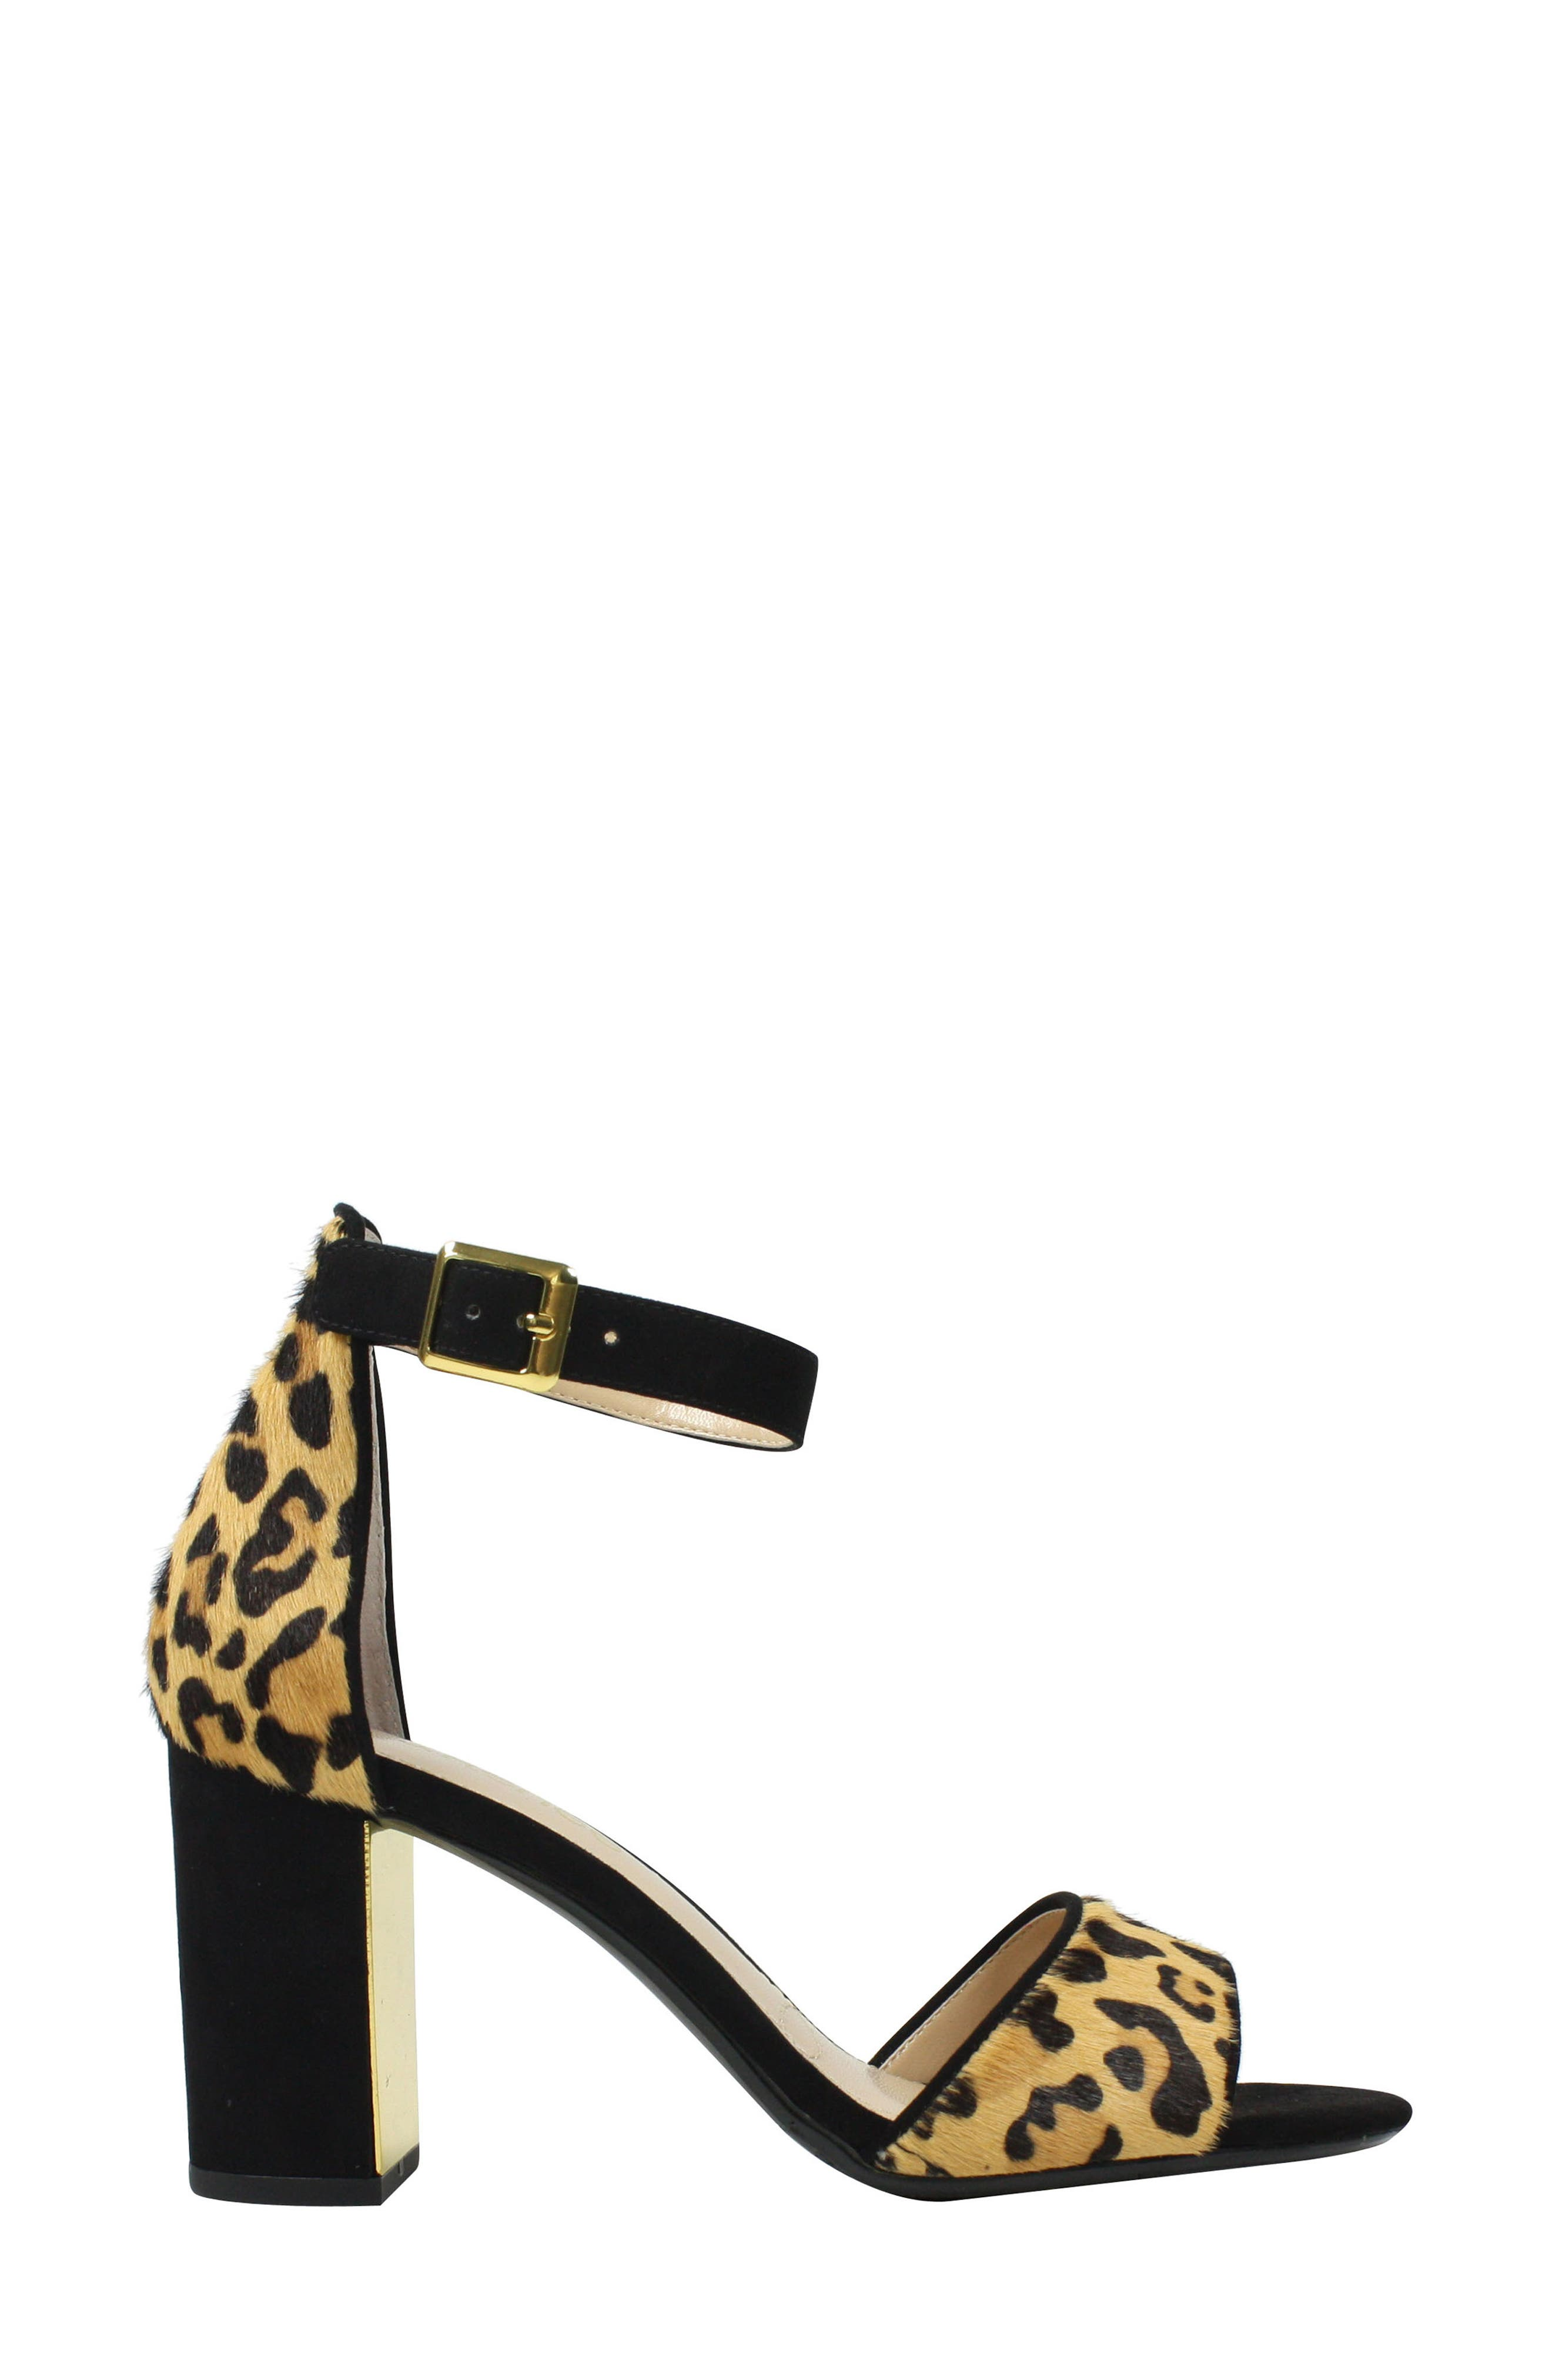 J. RENEÉ, Flaviana Ankle Strap Sandal, Alternate thumbnail 3, color, BLACK/ BROWN CALF HAIR